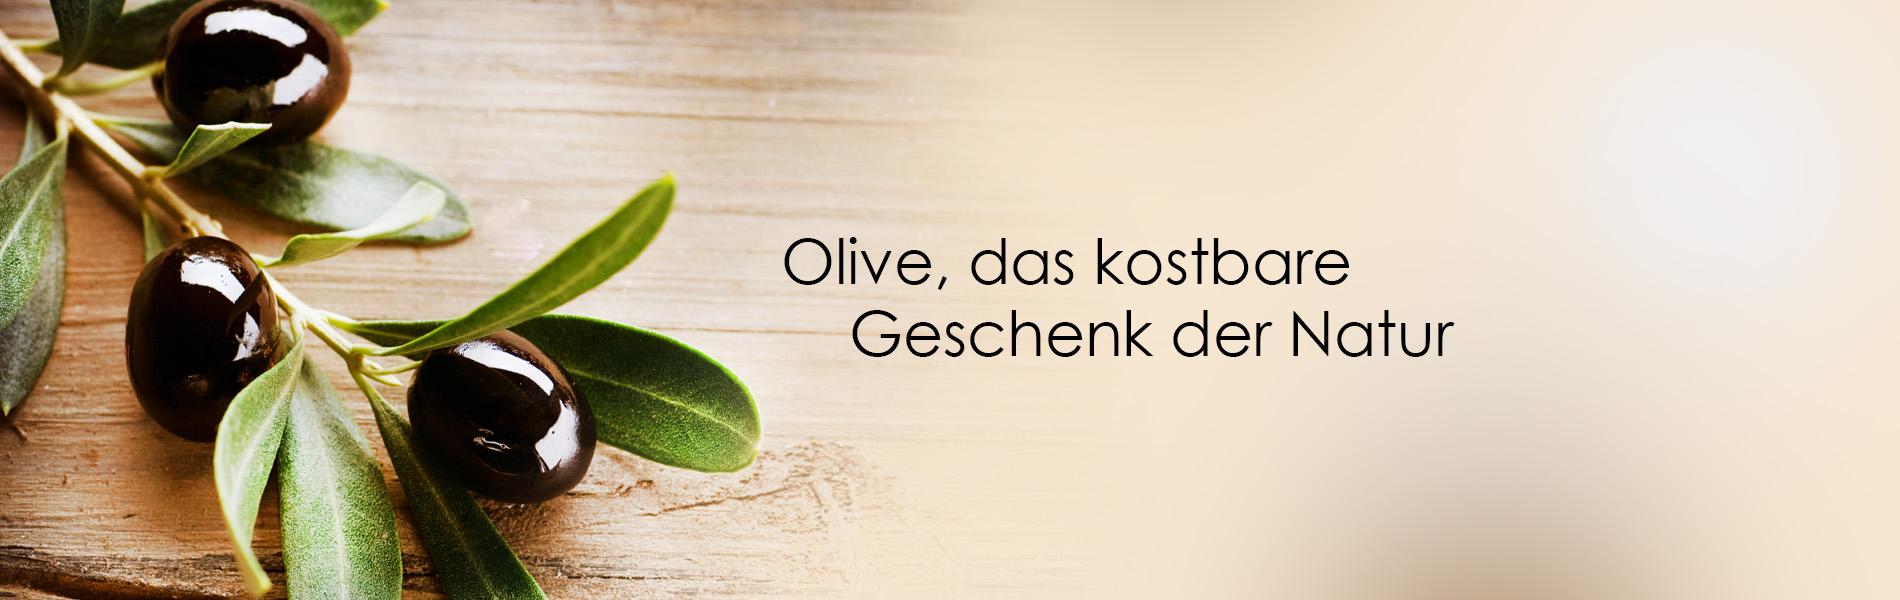 1900x600-olivenol-slider-02